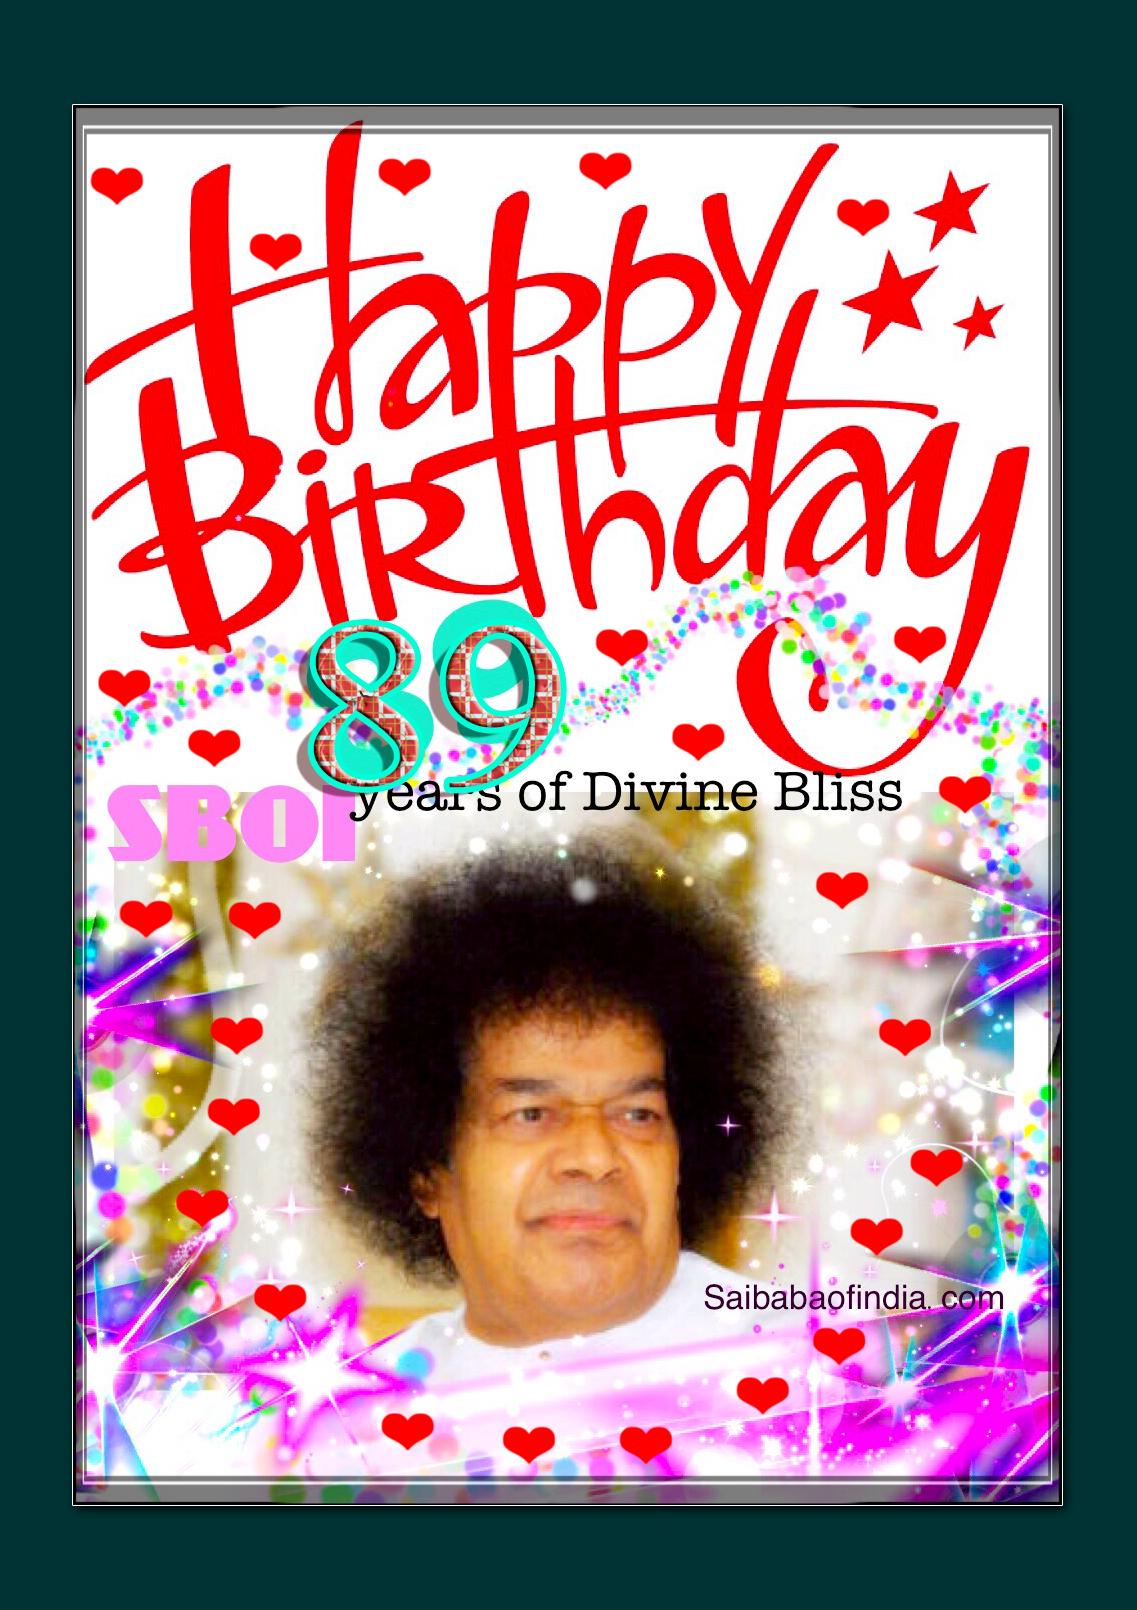 89th Sathya Sai Baba Happy Birthday Sai Baba Of Indias Weblog